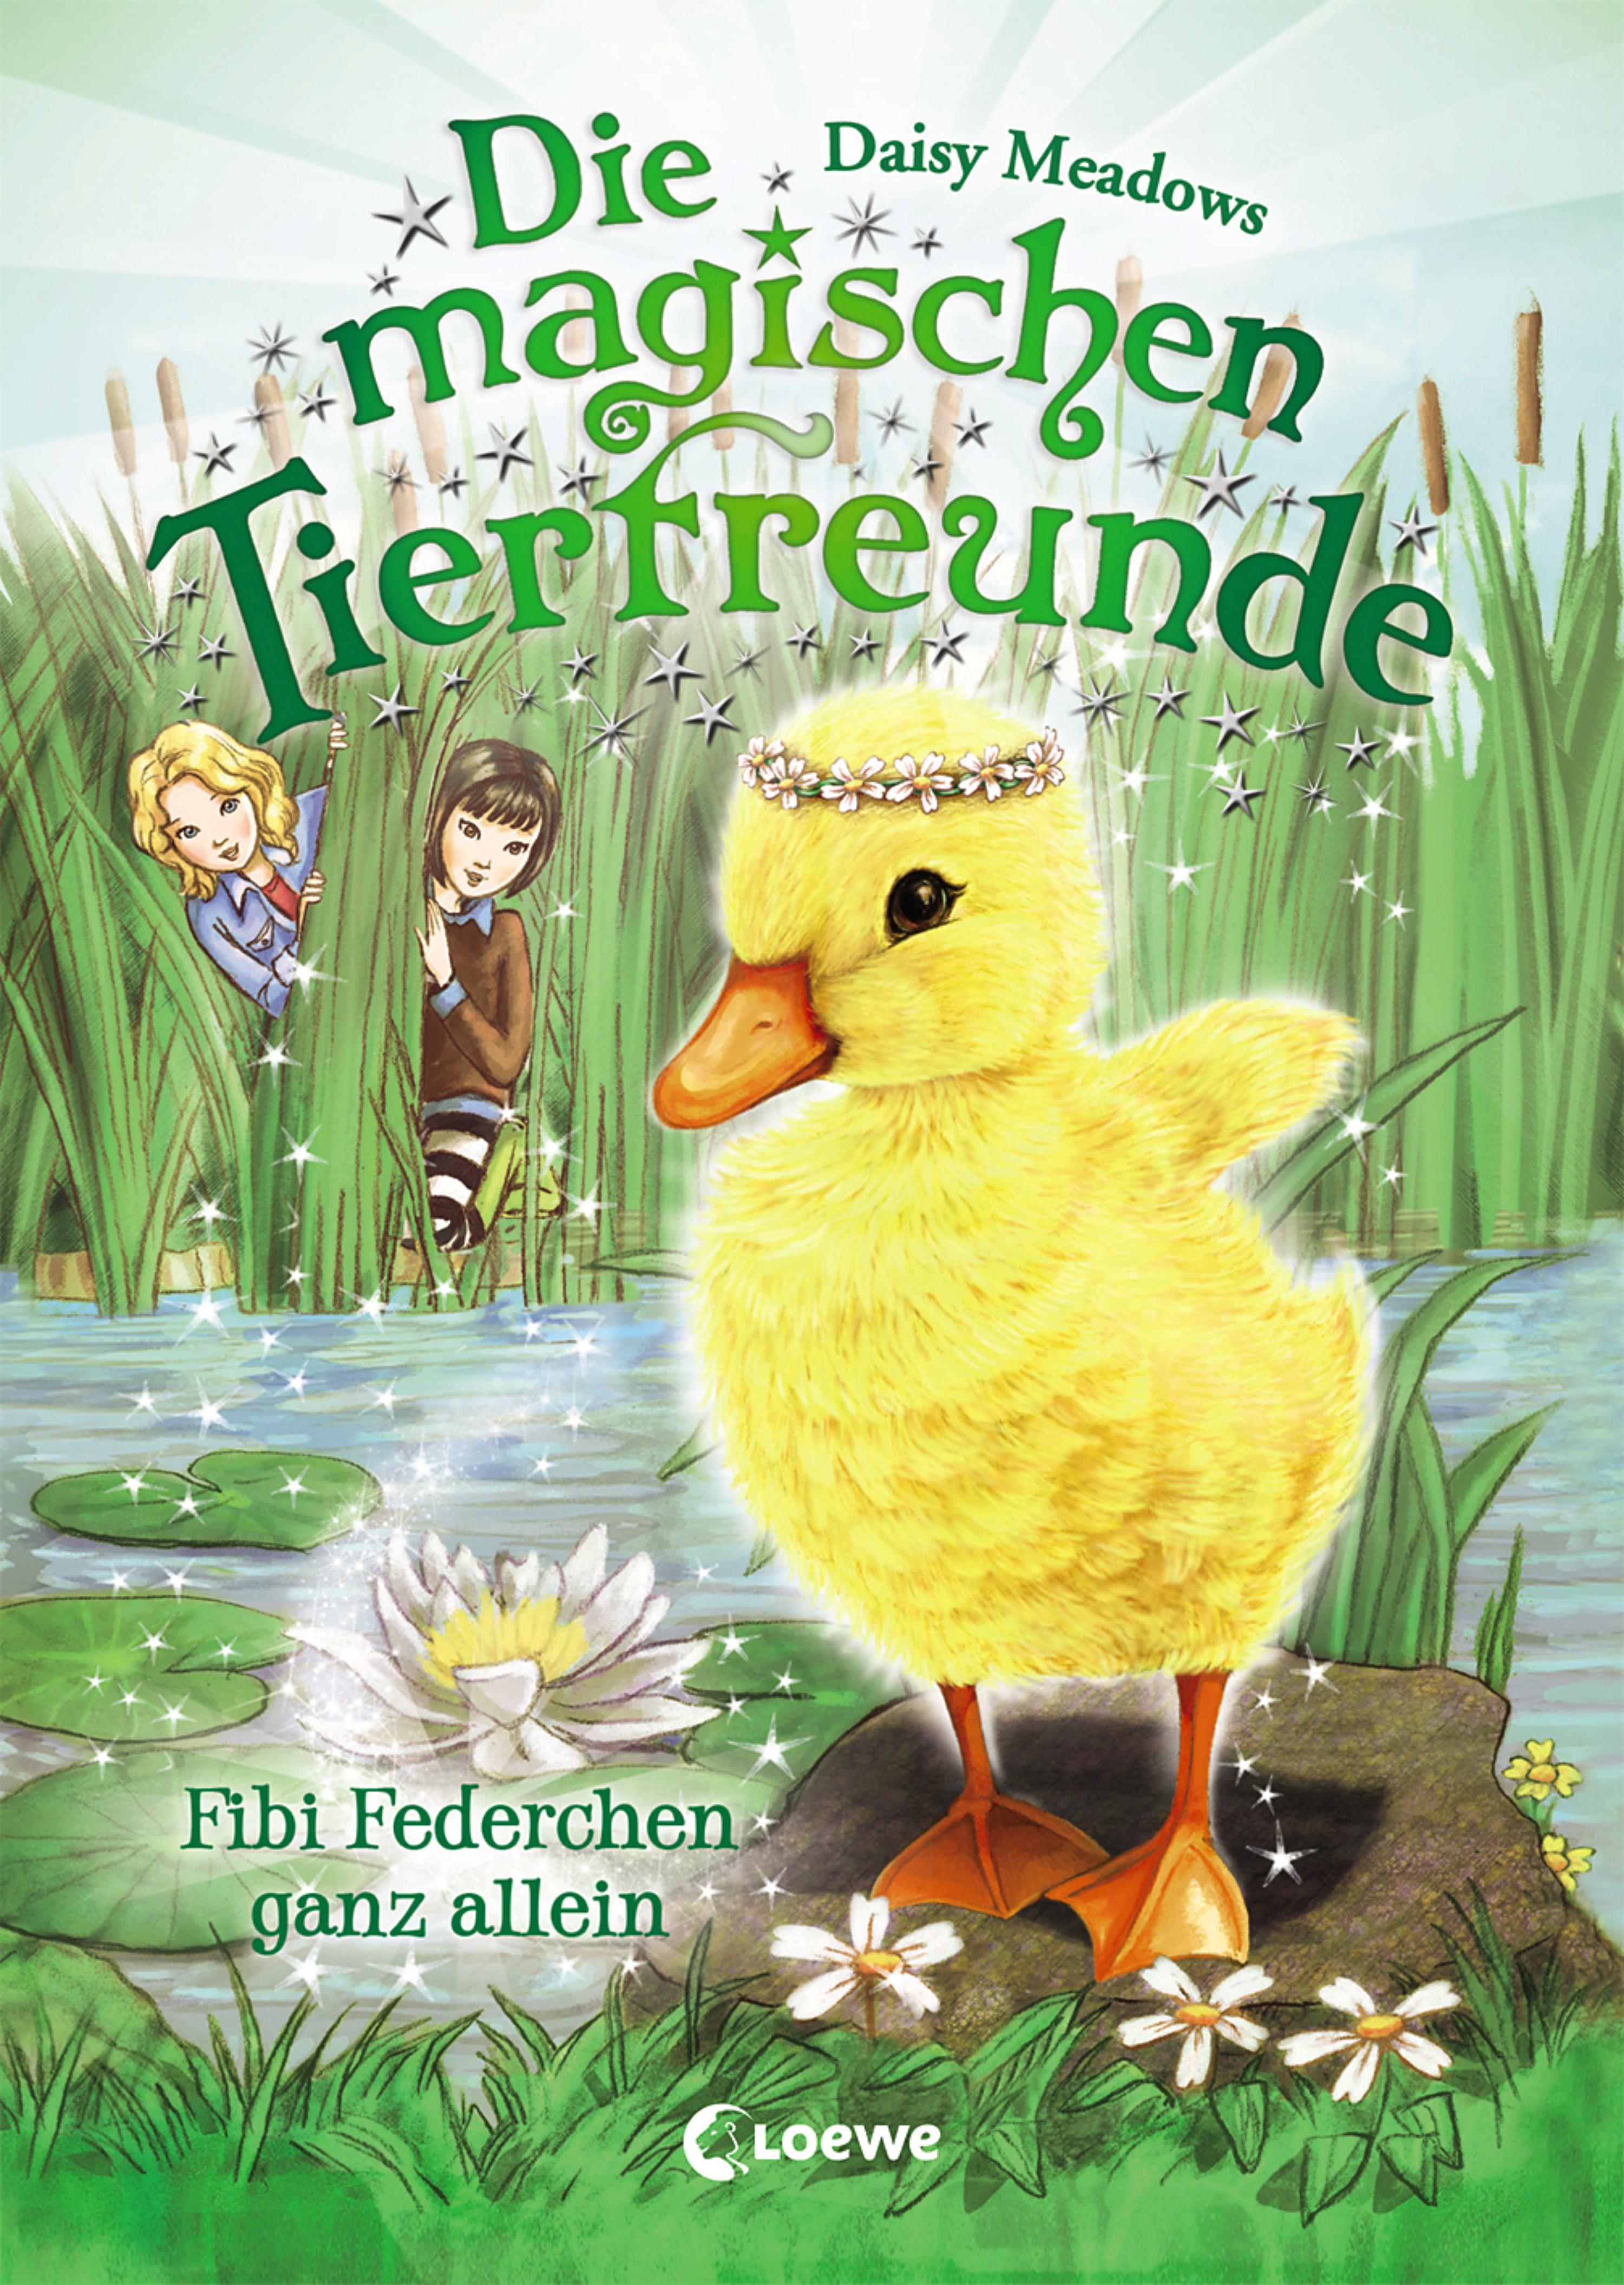 Daisy Meadows Die magischen Tierfreunde 3 - Fibi Federchen ganz allein daisy meadows magic animal friends early reader lucy longwhiskers